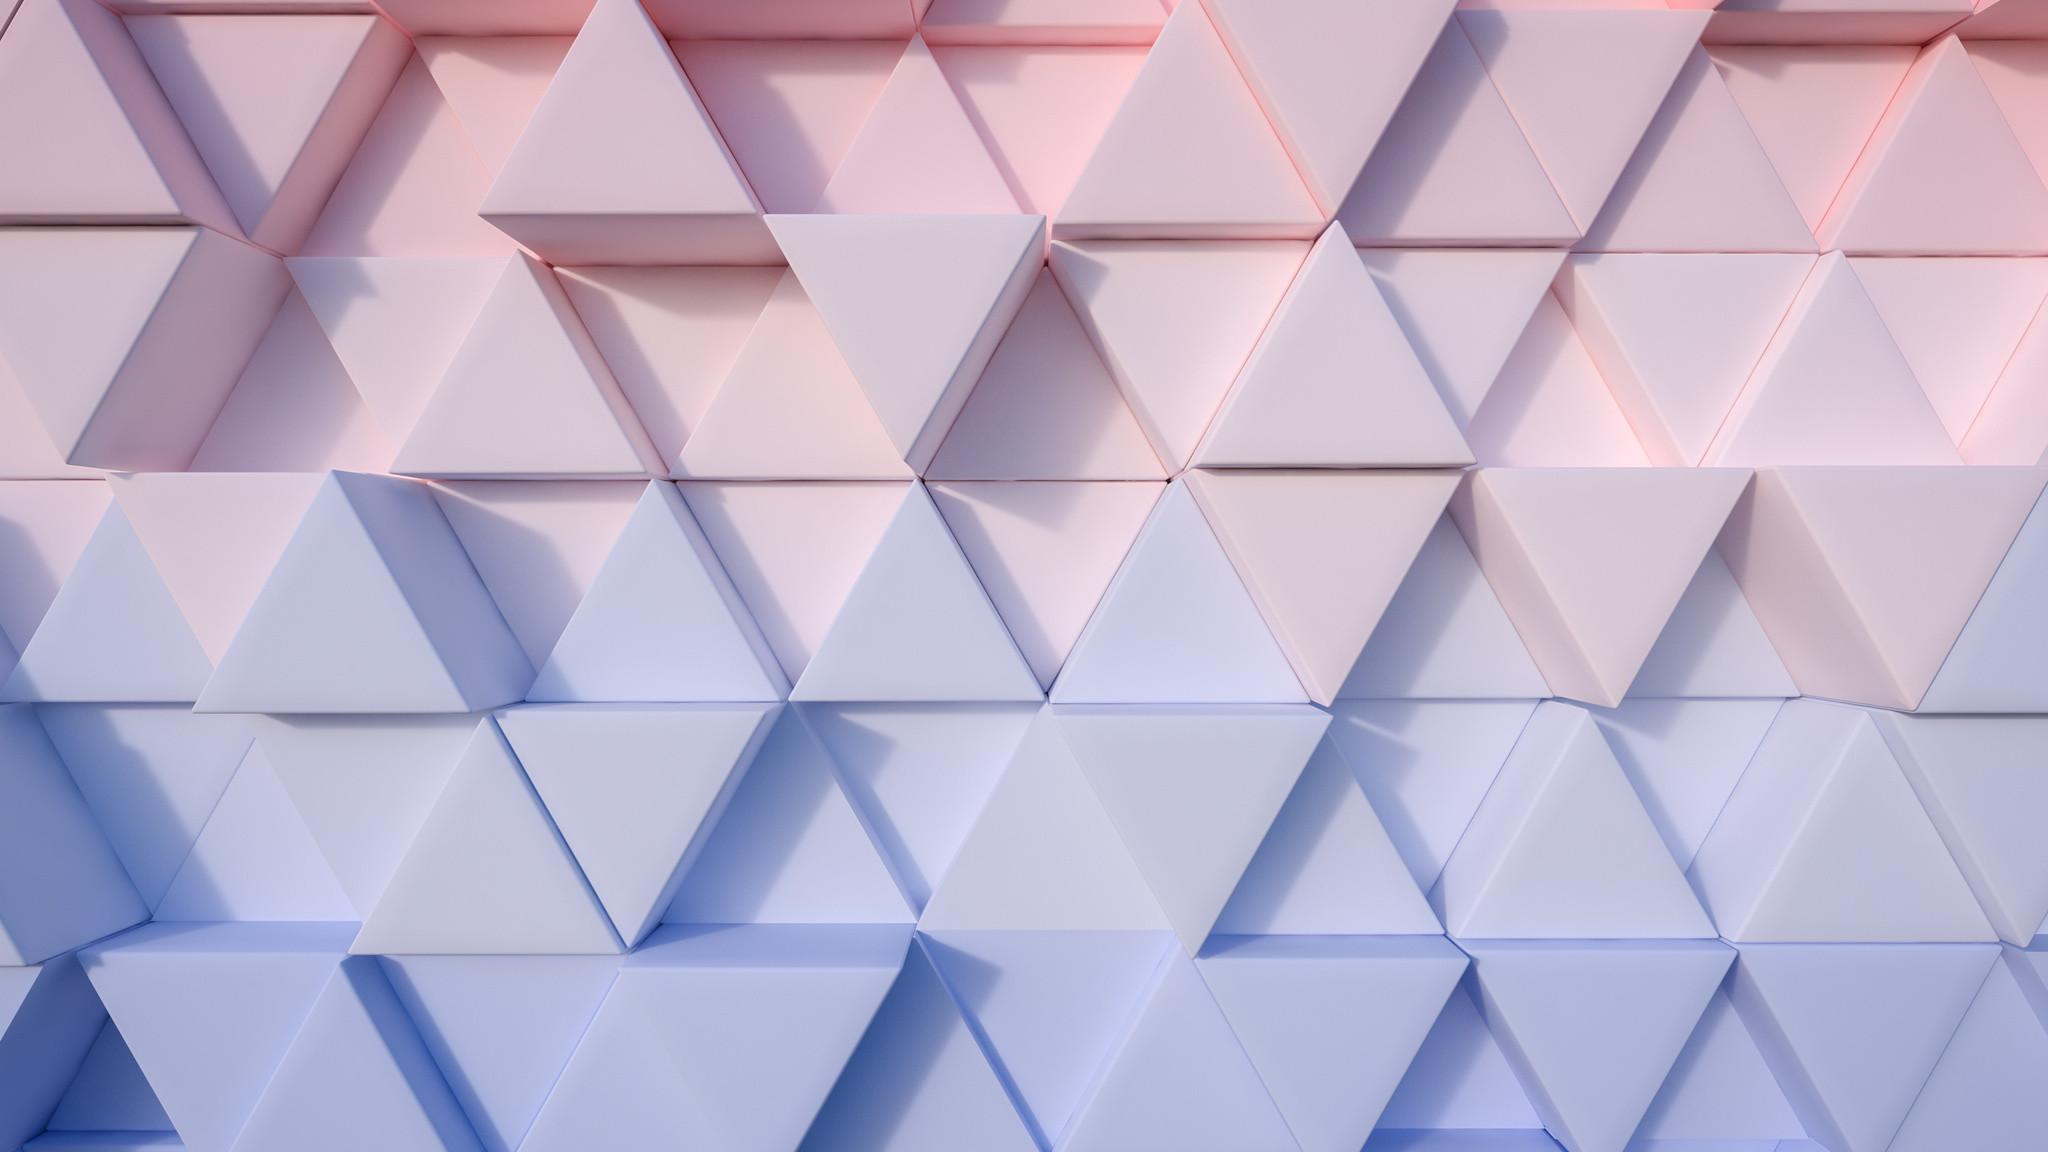 Res: 2048x1152, triangle-pastel-3d-4k-0d.jpg